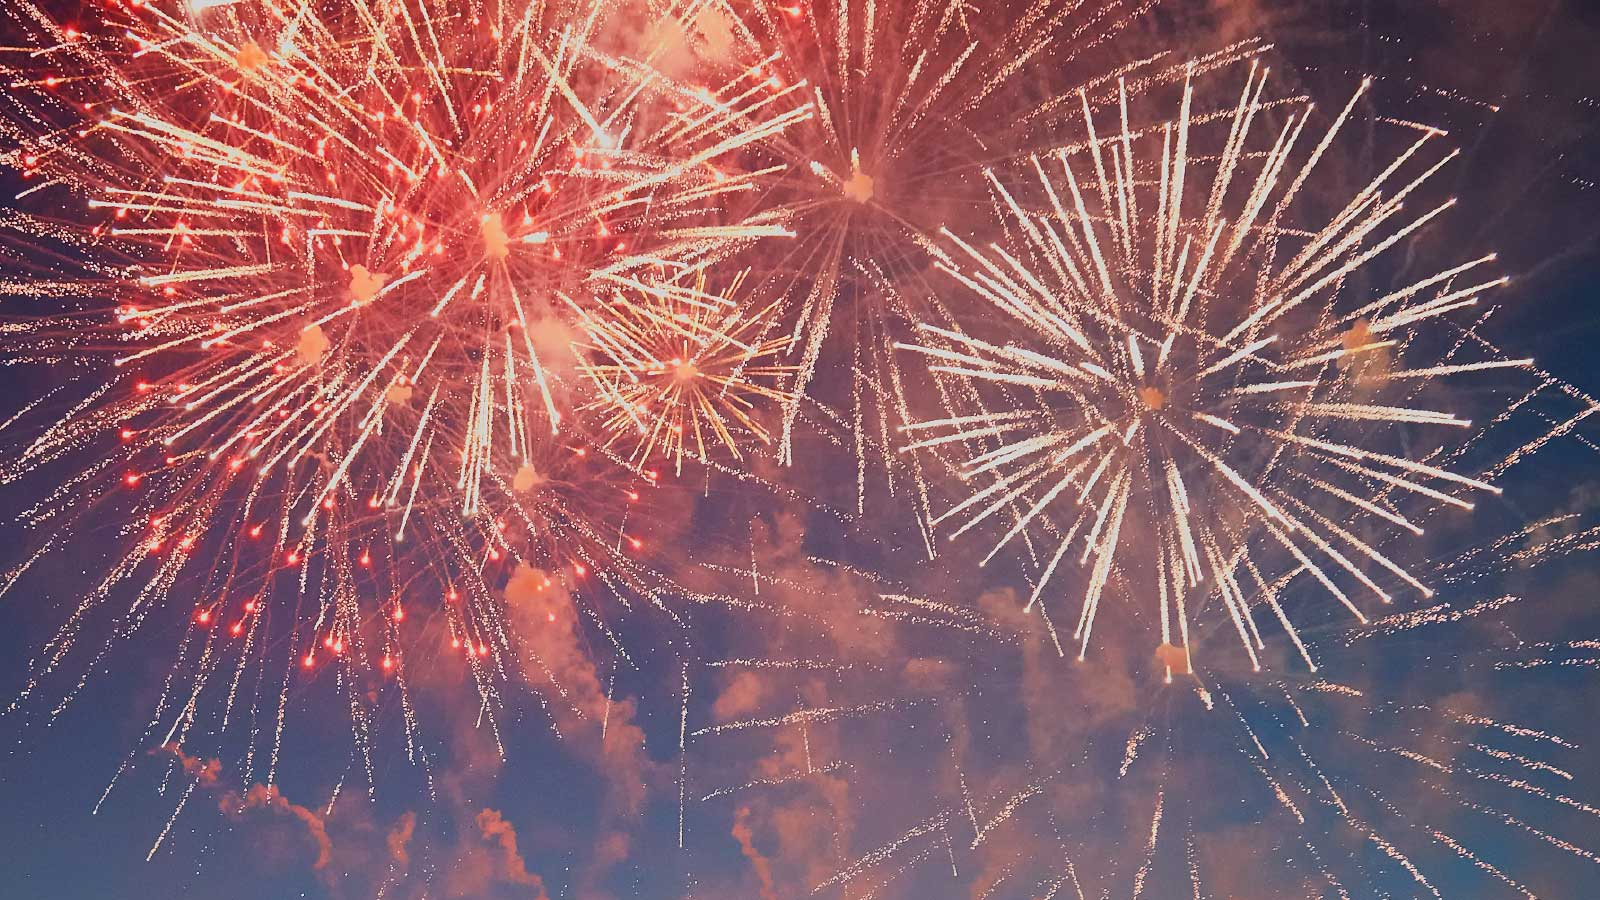 Shrewsbury Flower Show Fireworks